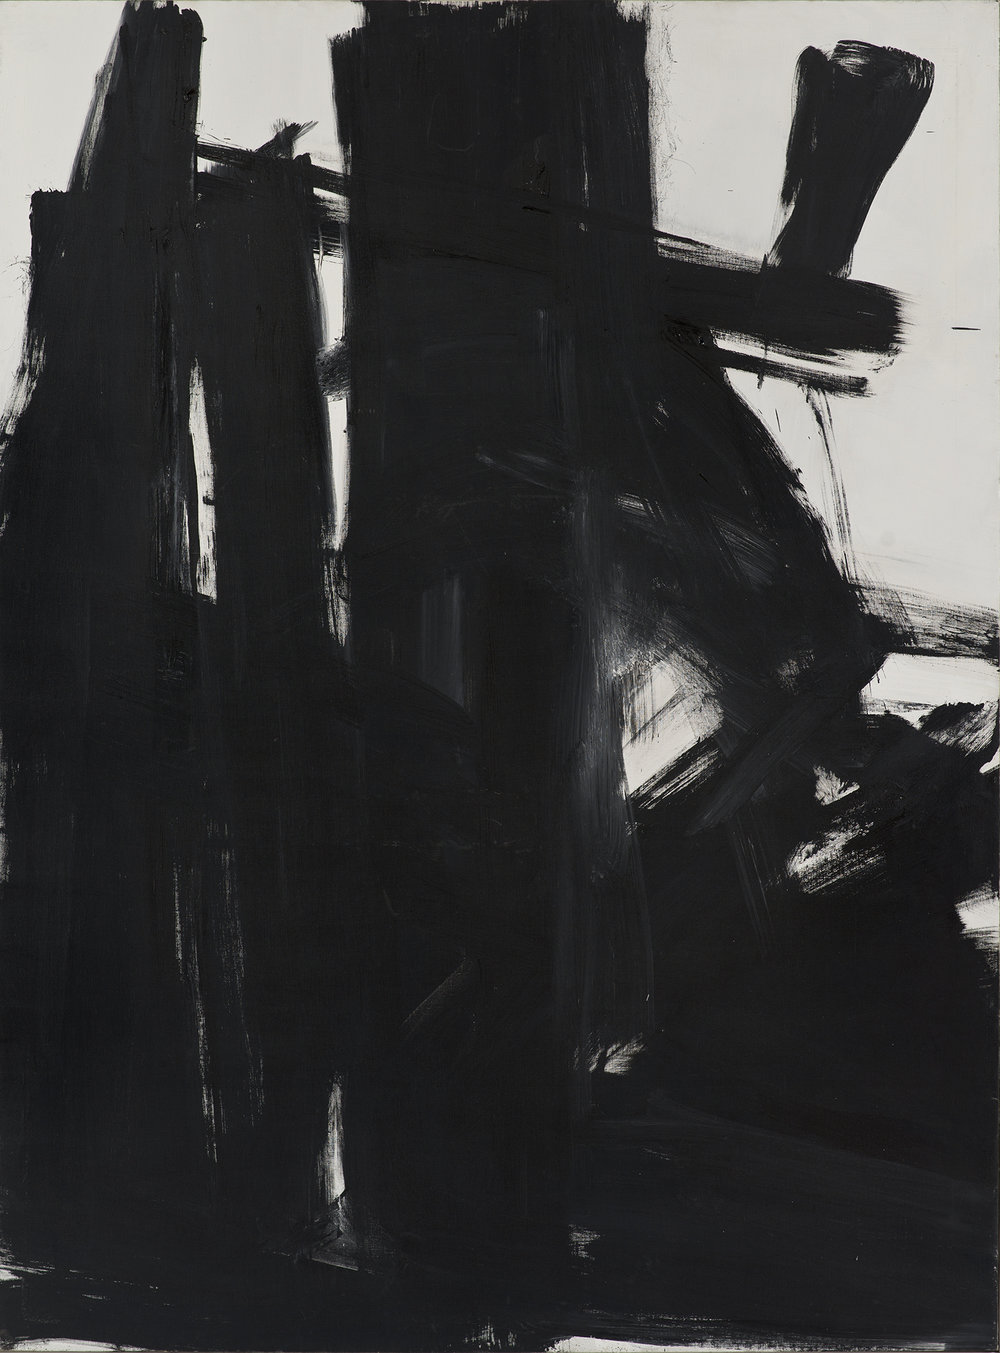 Kline, Black Iris (1961)